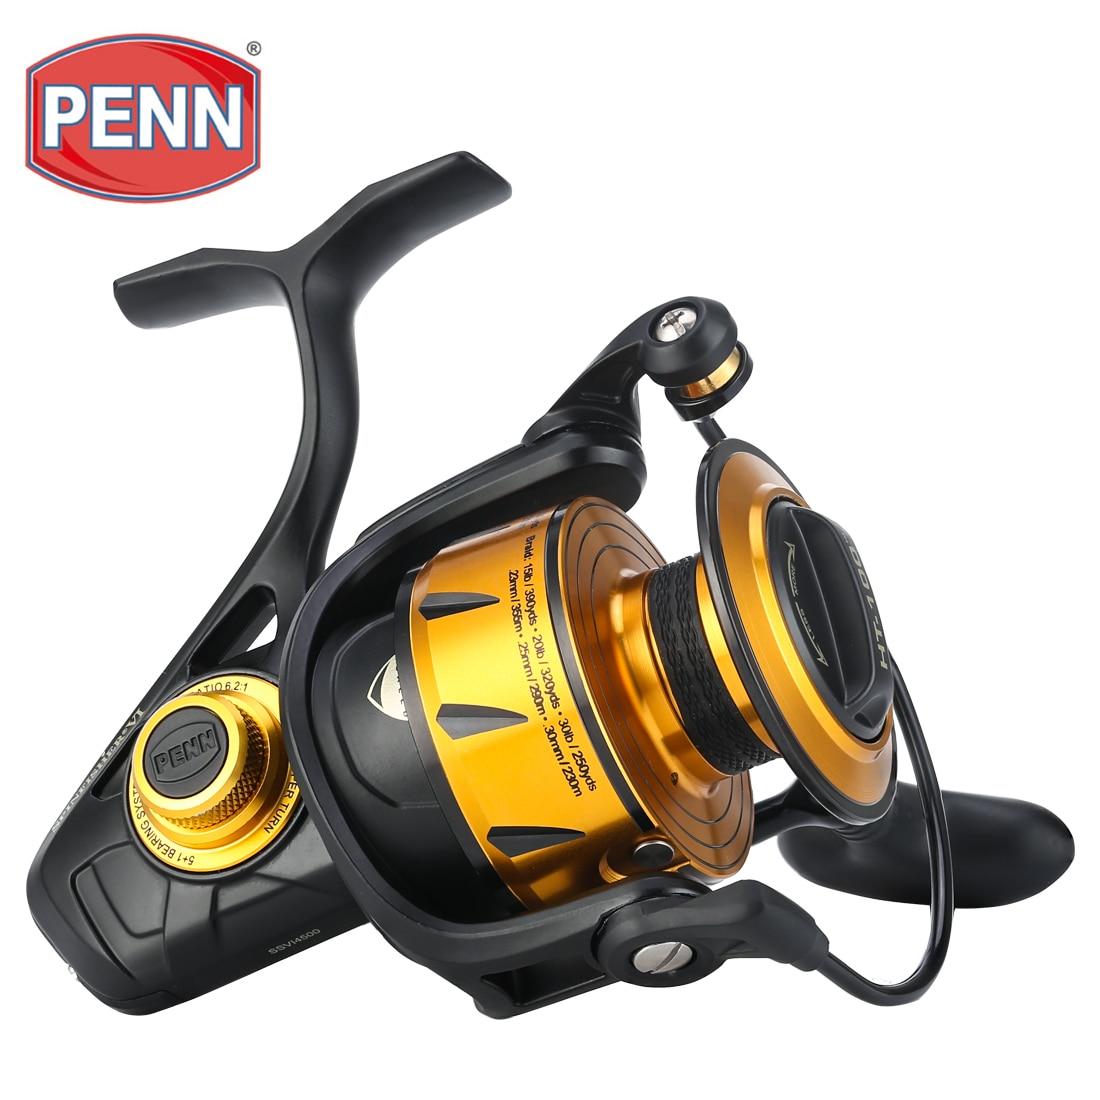 PENN Spinfisher VI Saltwater Reel 2